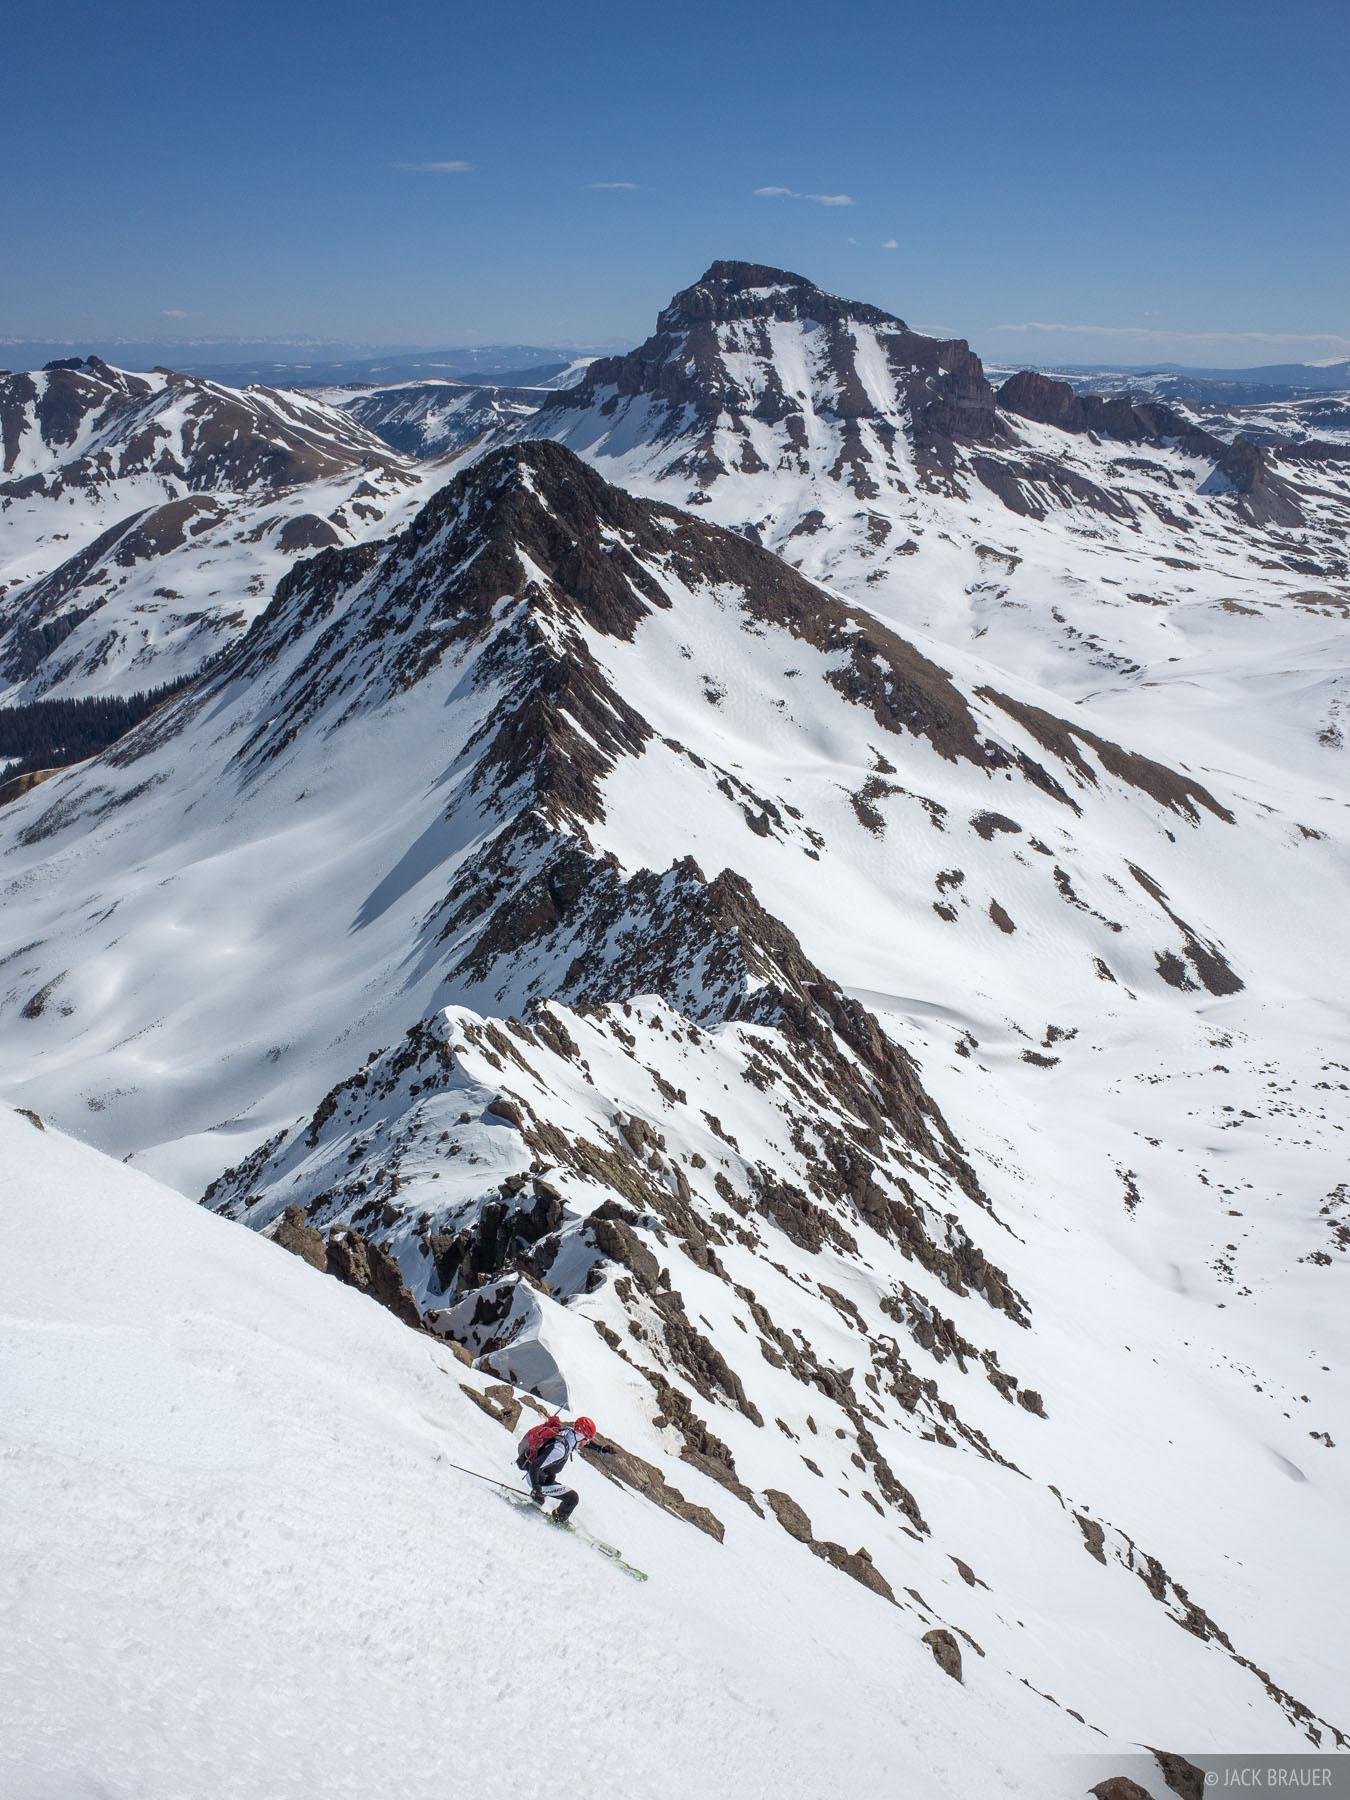 Colorado, San Juan Mountains, Uncompahgre Wilderness, Wetterhorn Peak, skiing, Uncompahgre Peak, photo